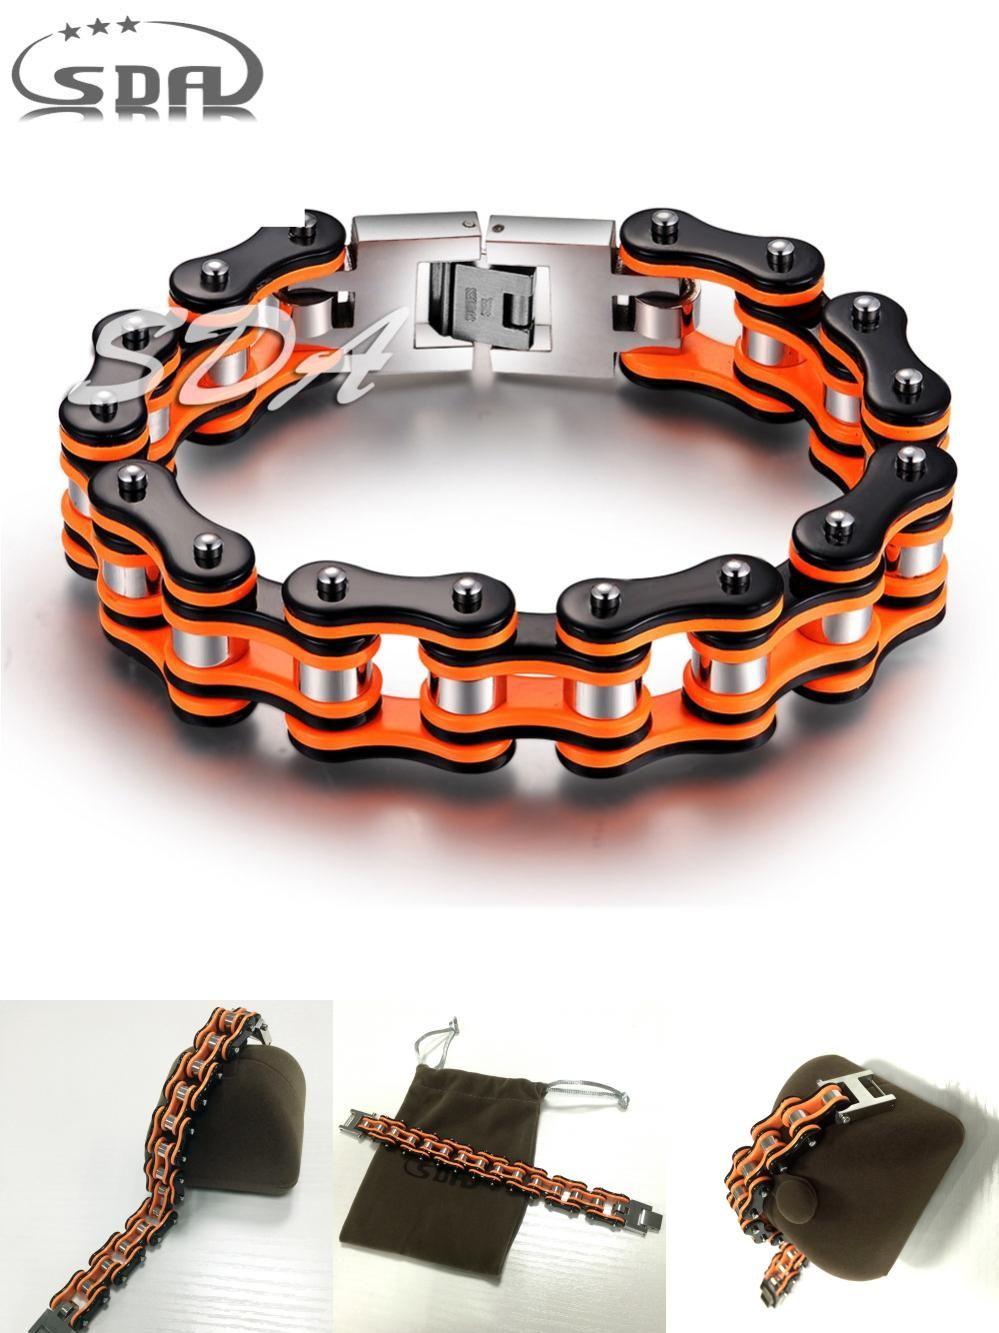 Visit To Buy Hot Sale Sda Orange Black Motorcycle Chain Bracelets